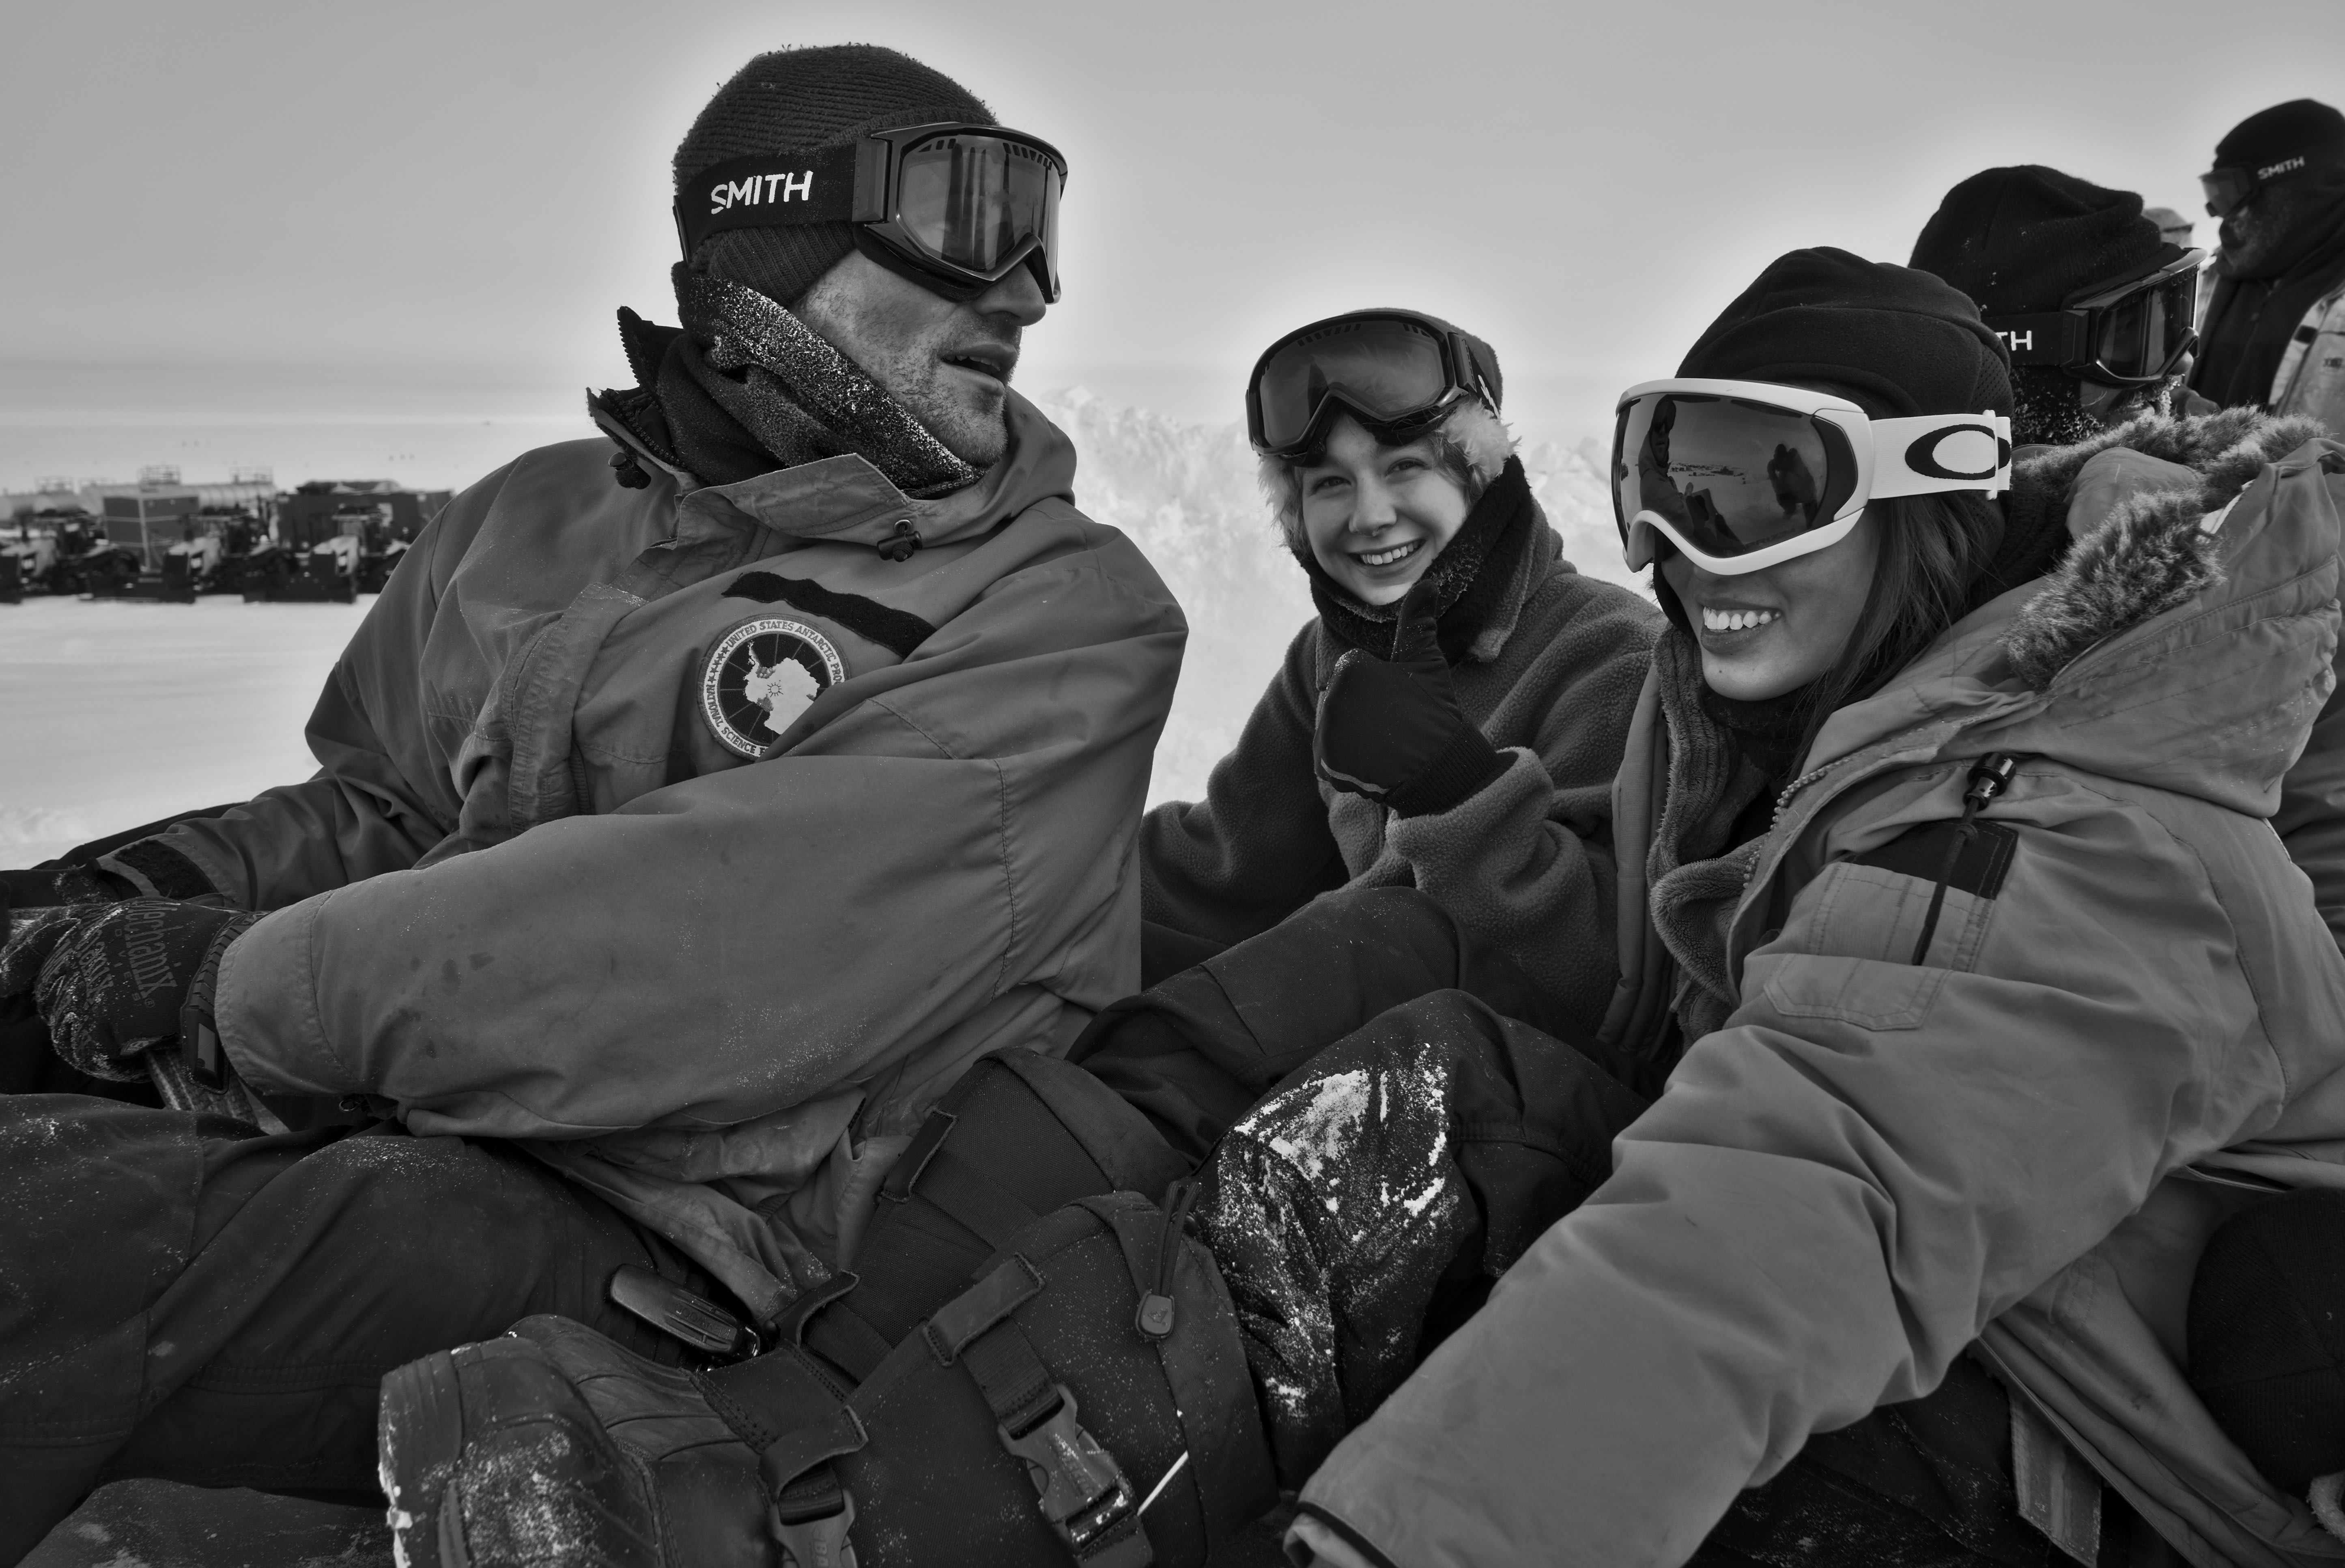 Winterovers going sledding